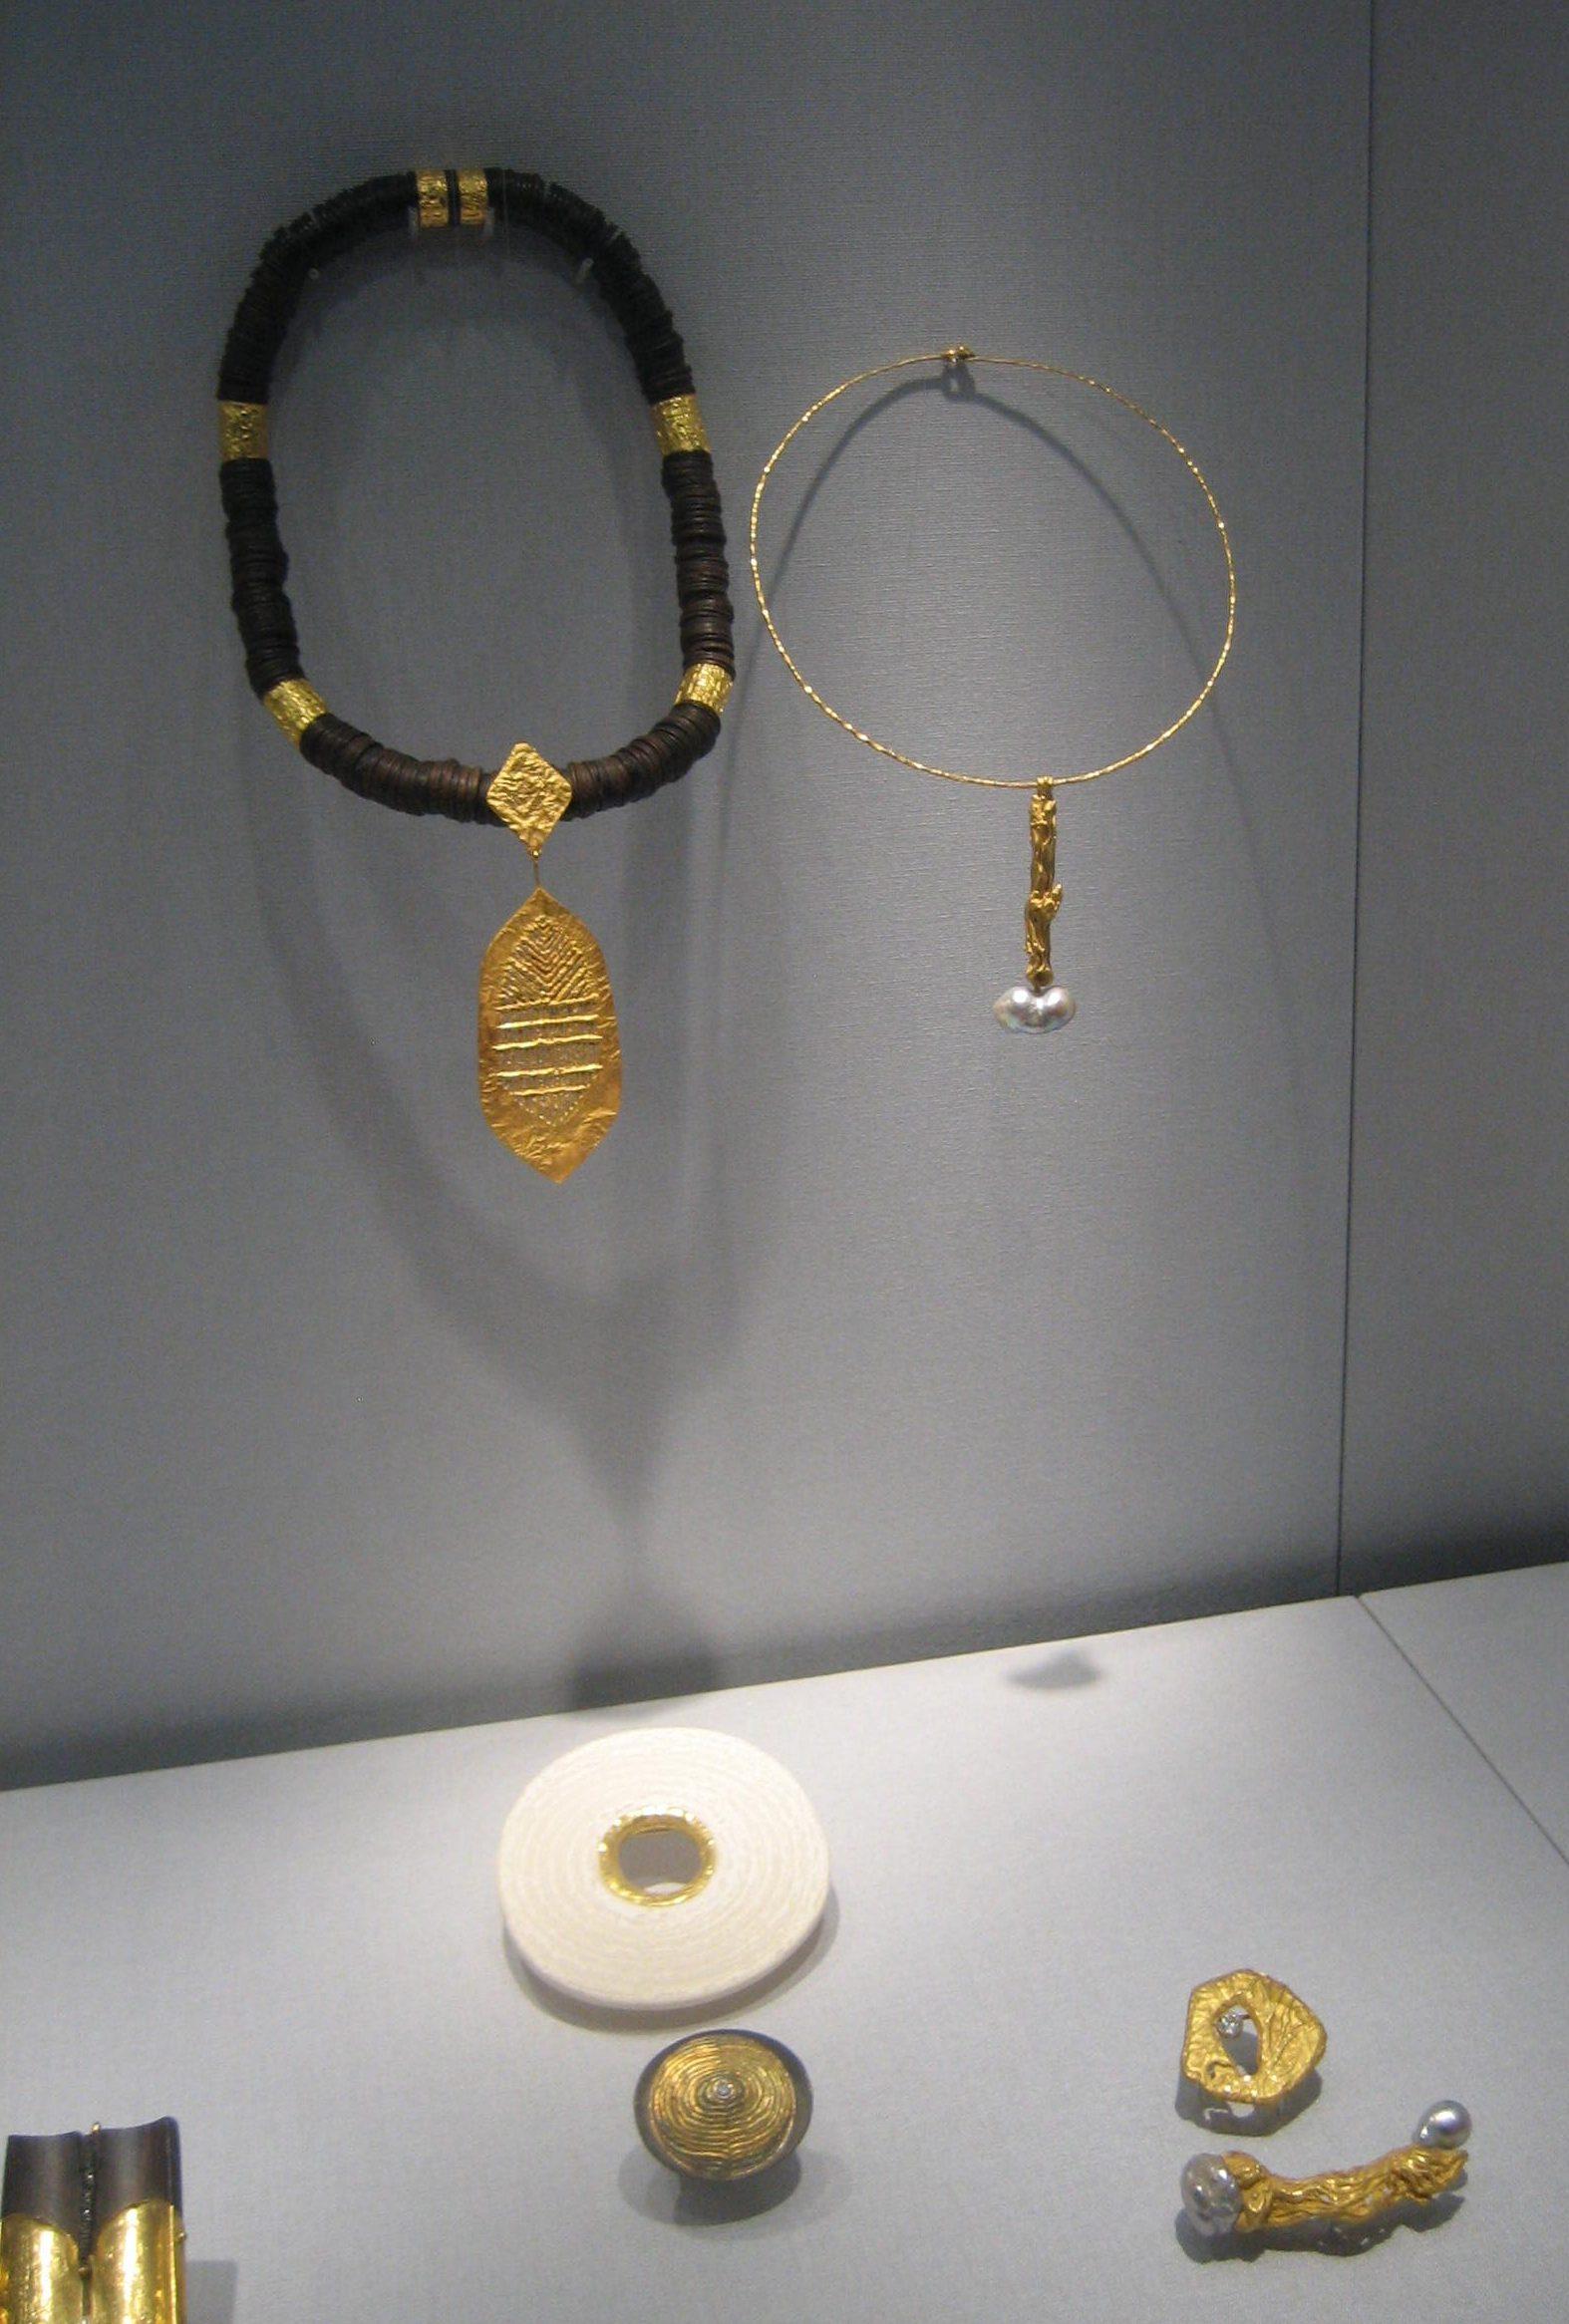 Ebbe Weiss-Weingart. Schmuckmuseum Pforzheim. Foto Coert Peter Krabbe, mei 2019, goud, vitrine, ebbenhout, ivoor, diamant, parel